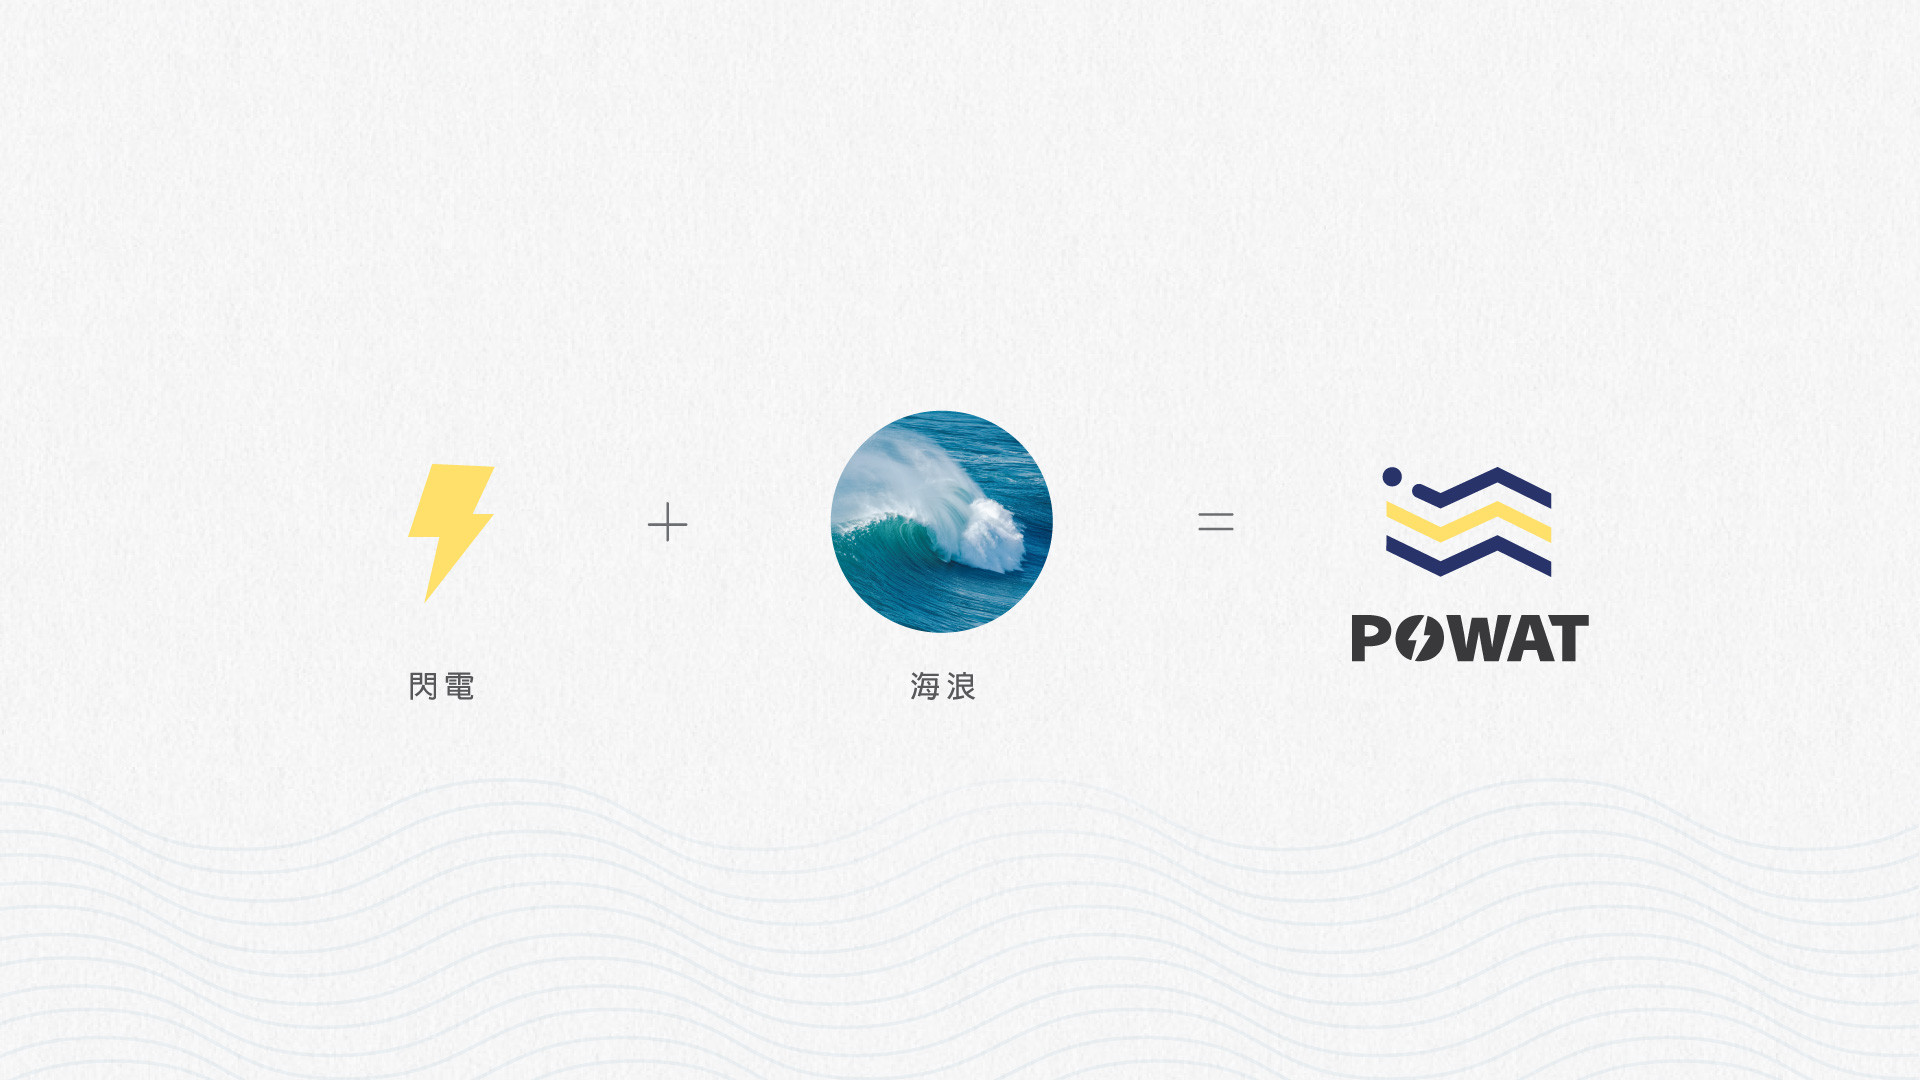 POWAT-3.jpg